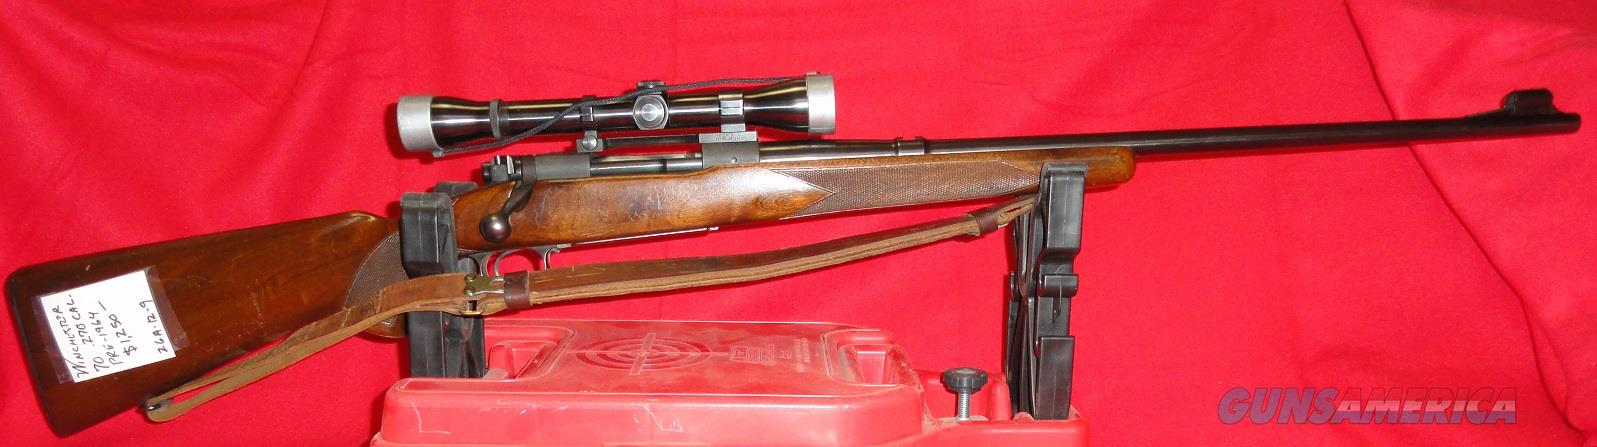 Winchester Model 70 w/ Weaver K4 60-B Scope  Guns > Rifles > Winchester Rifles - Modern Bolt/Auto/Single > Model 70 > Pre-64